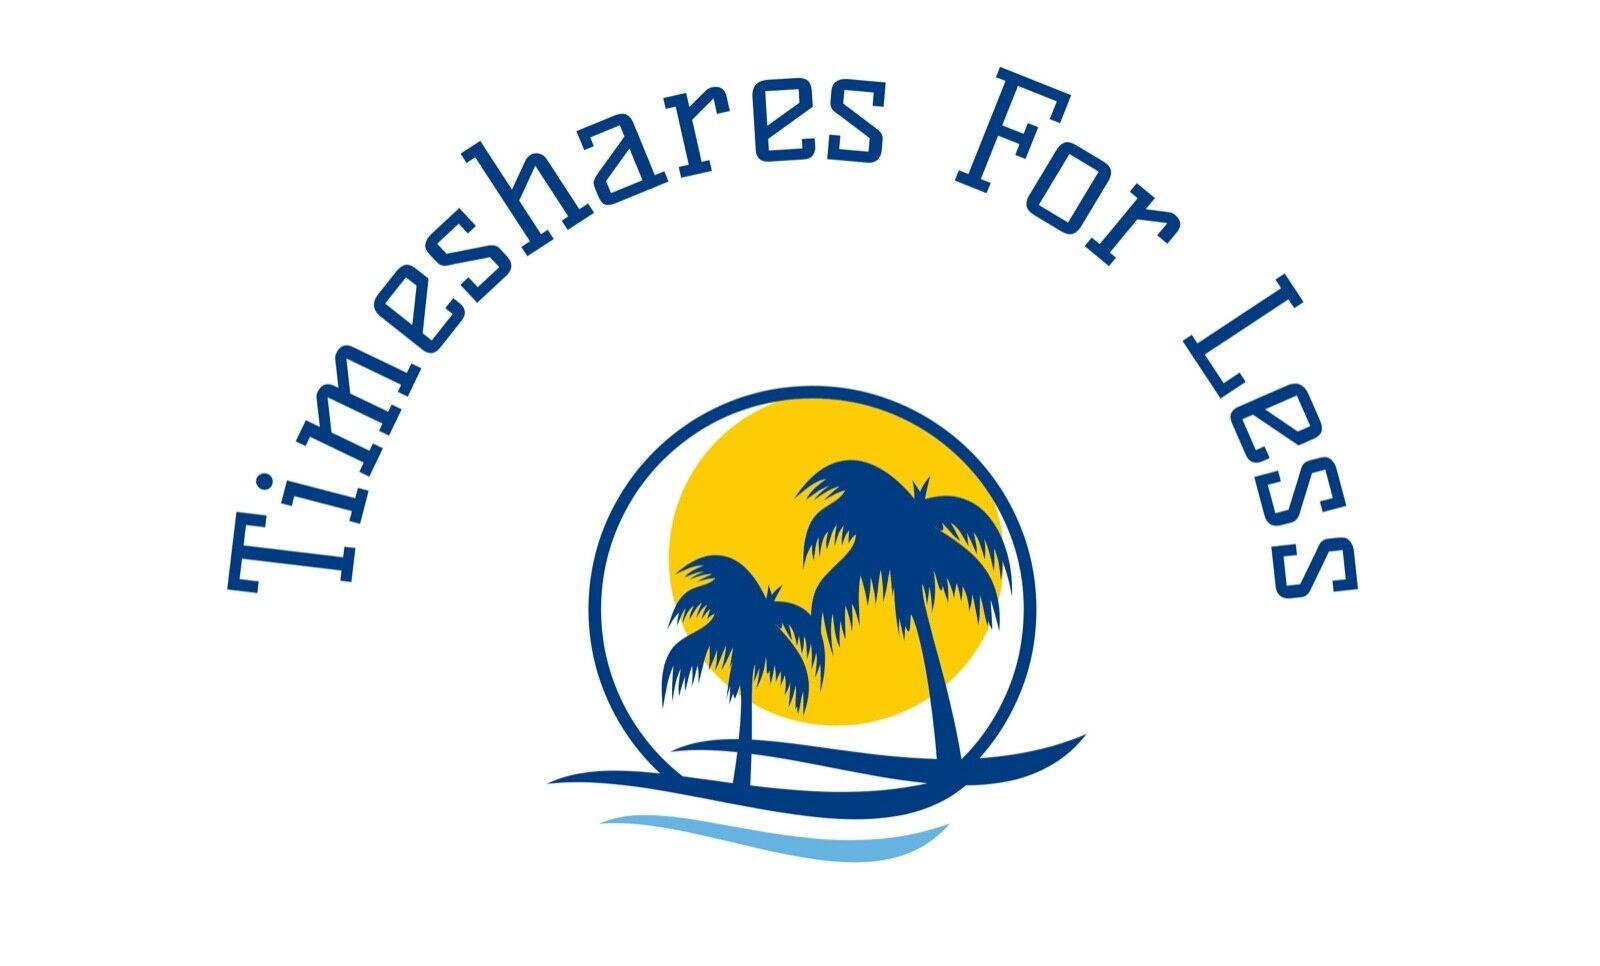 BERKLEY ORLANDO RESORT TIMESHARE 4B 105k RCI ANNUAL FLOAT USE KISSIMMEE FLORIDA - $0.99